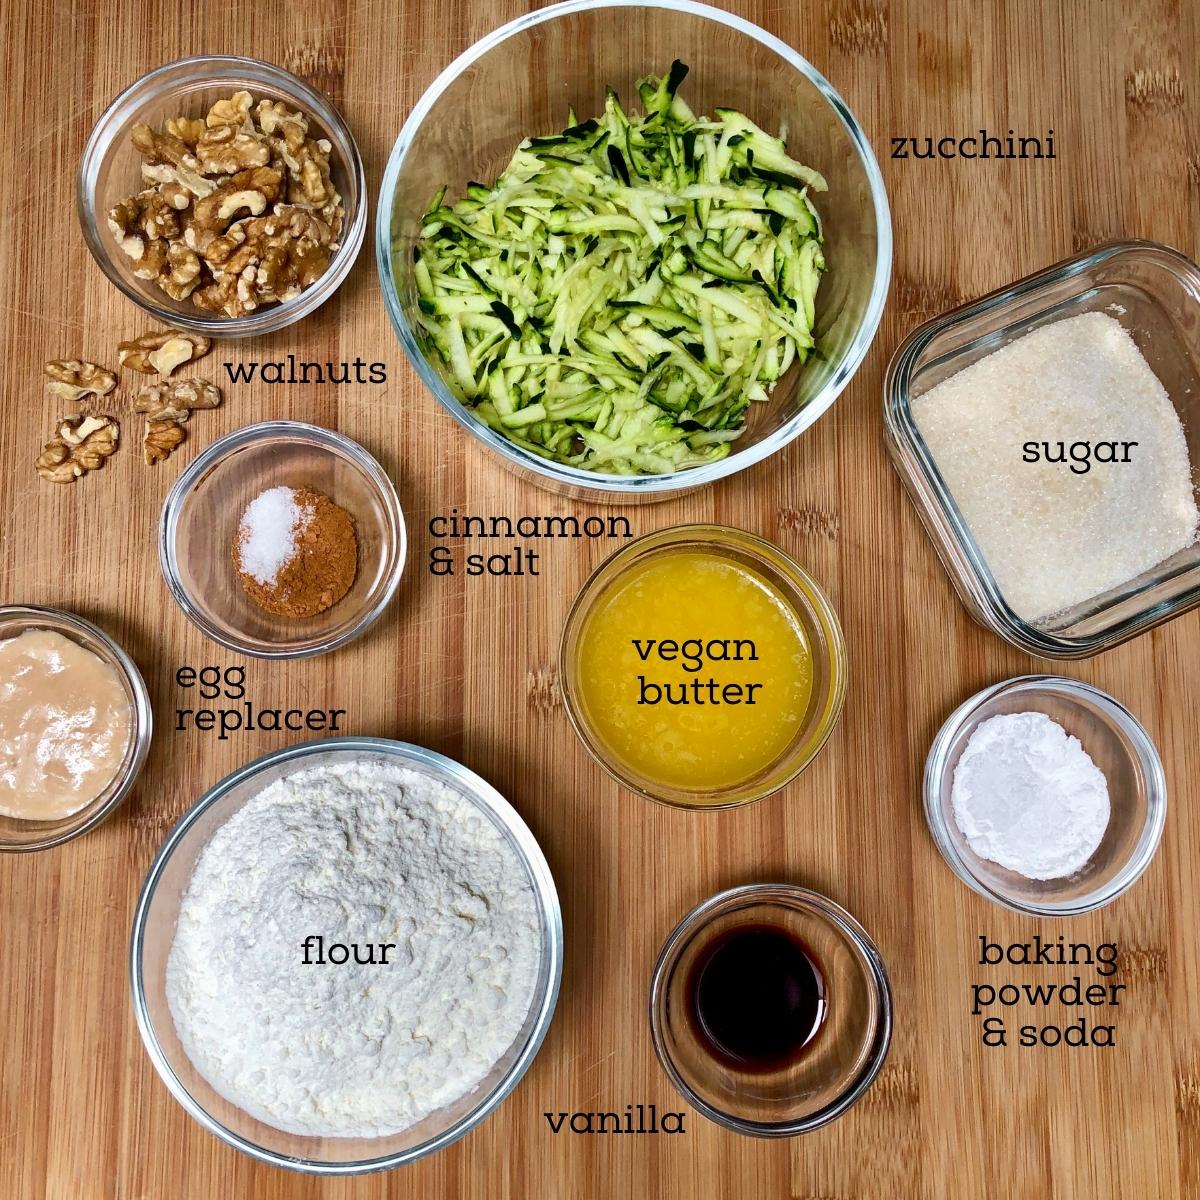 Ingredients to make simple vegan zucchini bread.